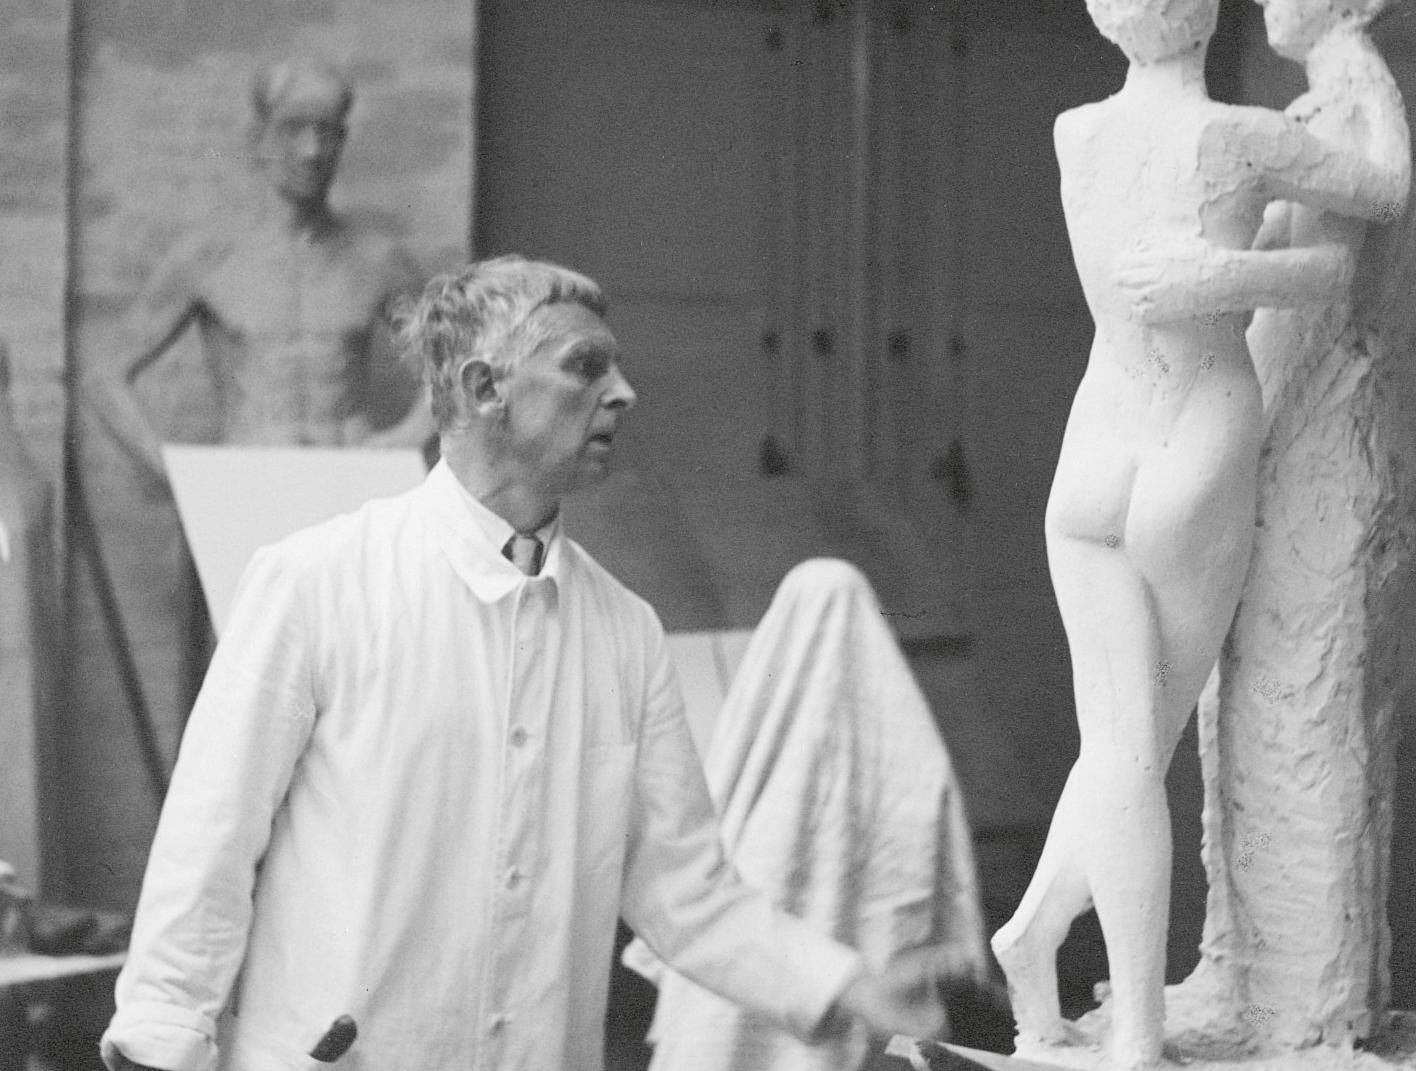 undated black and white photo of Gerhard Marcks working in his studio